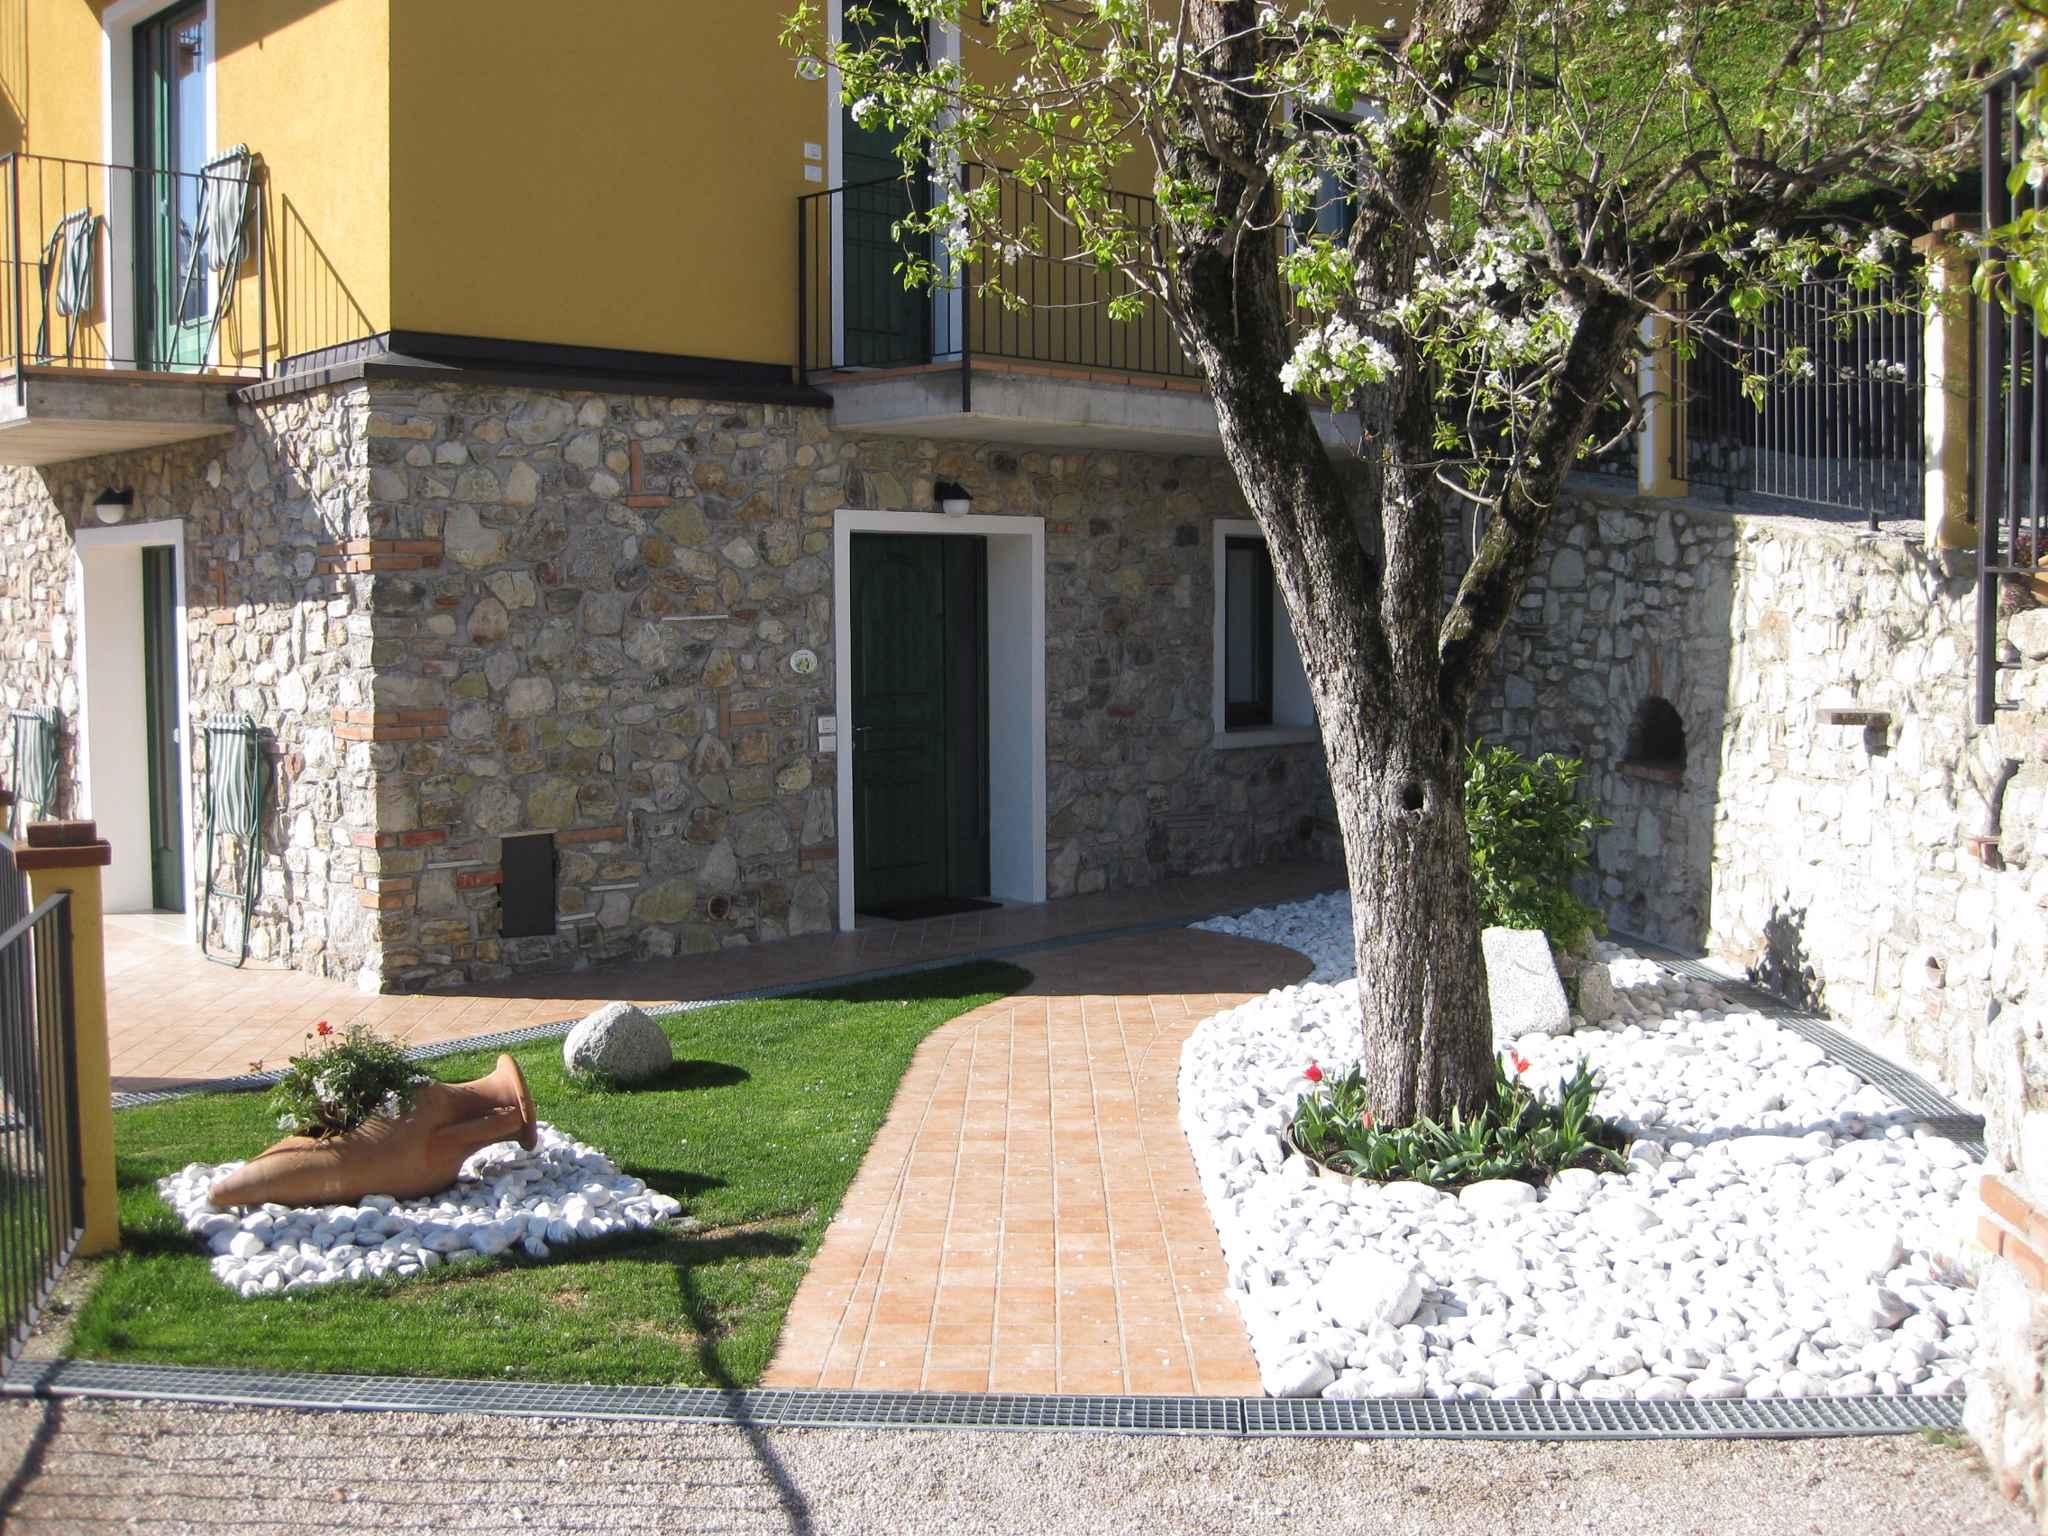 Ferienwohnung Residenz Fenil del Santo   Tremosine